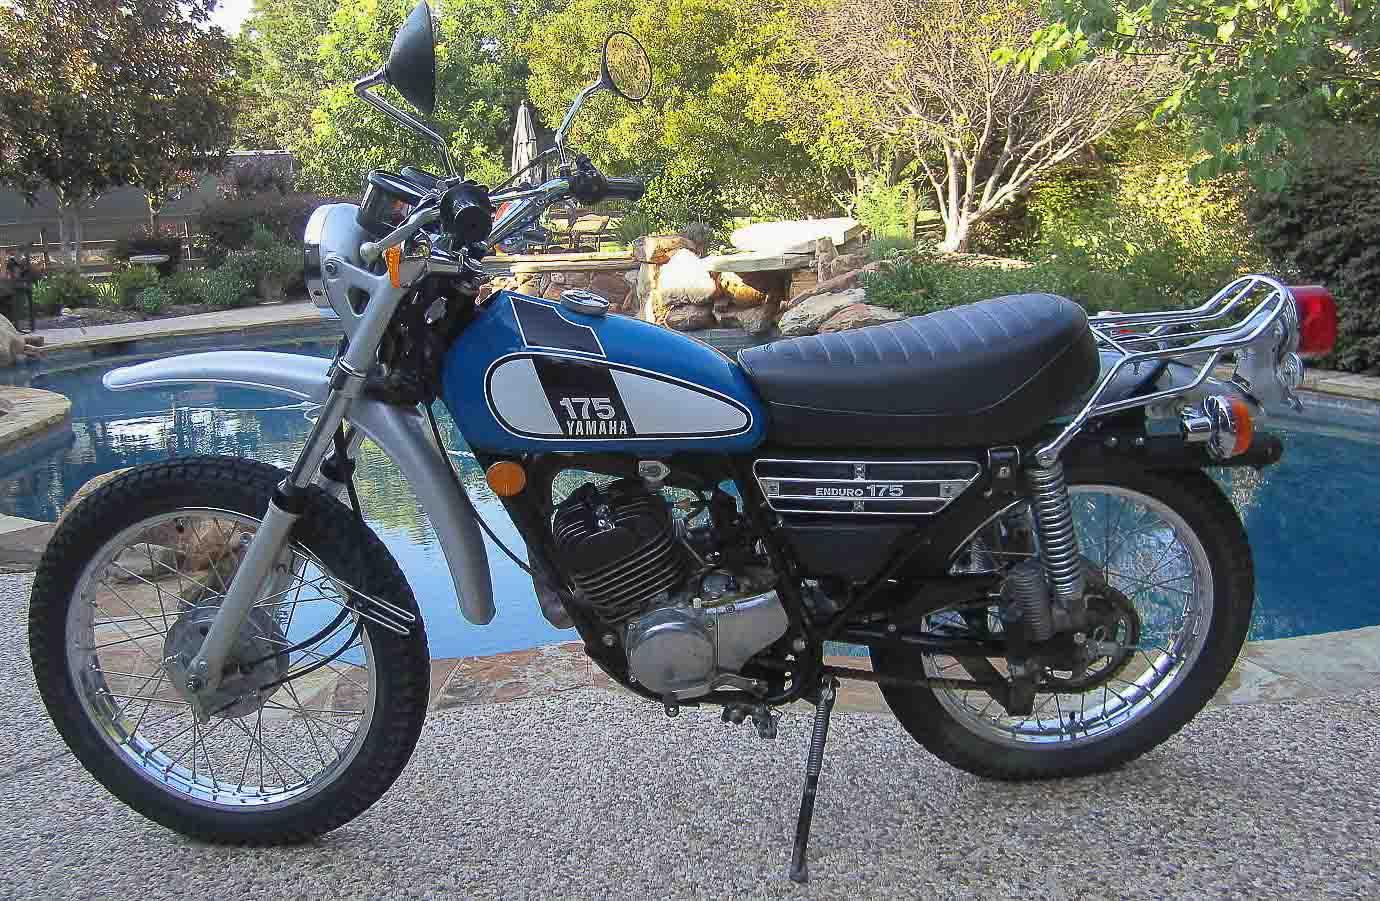 YAMAHA DT 175 (1974 - 1981)